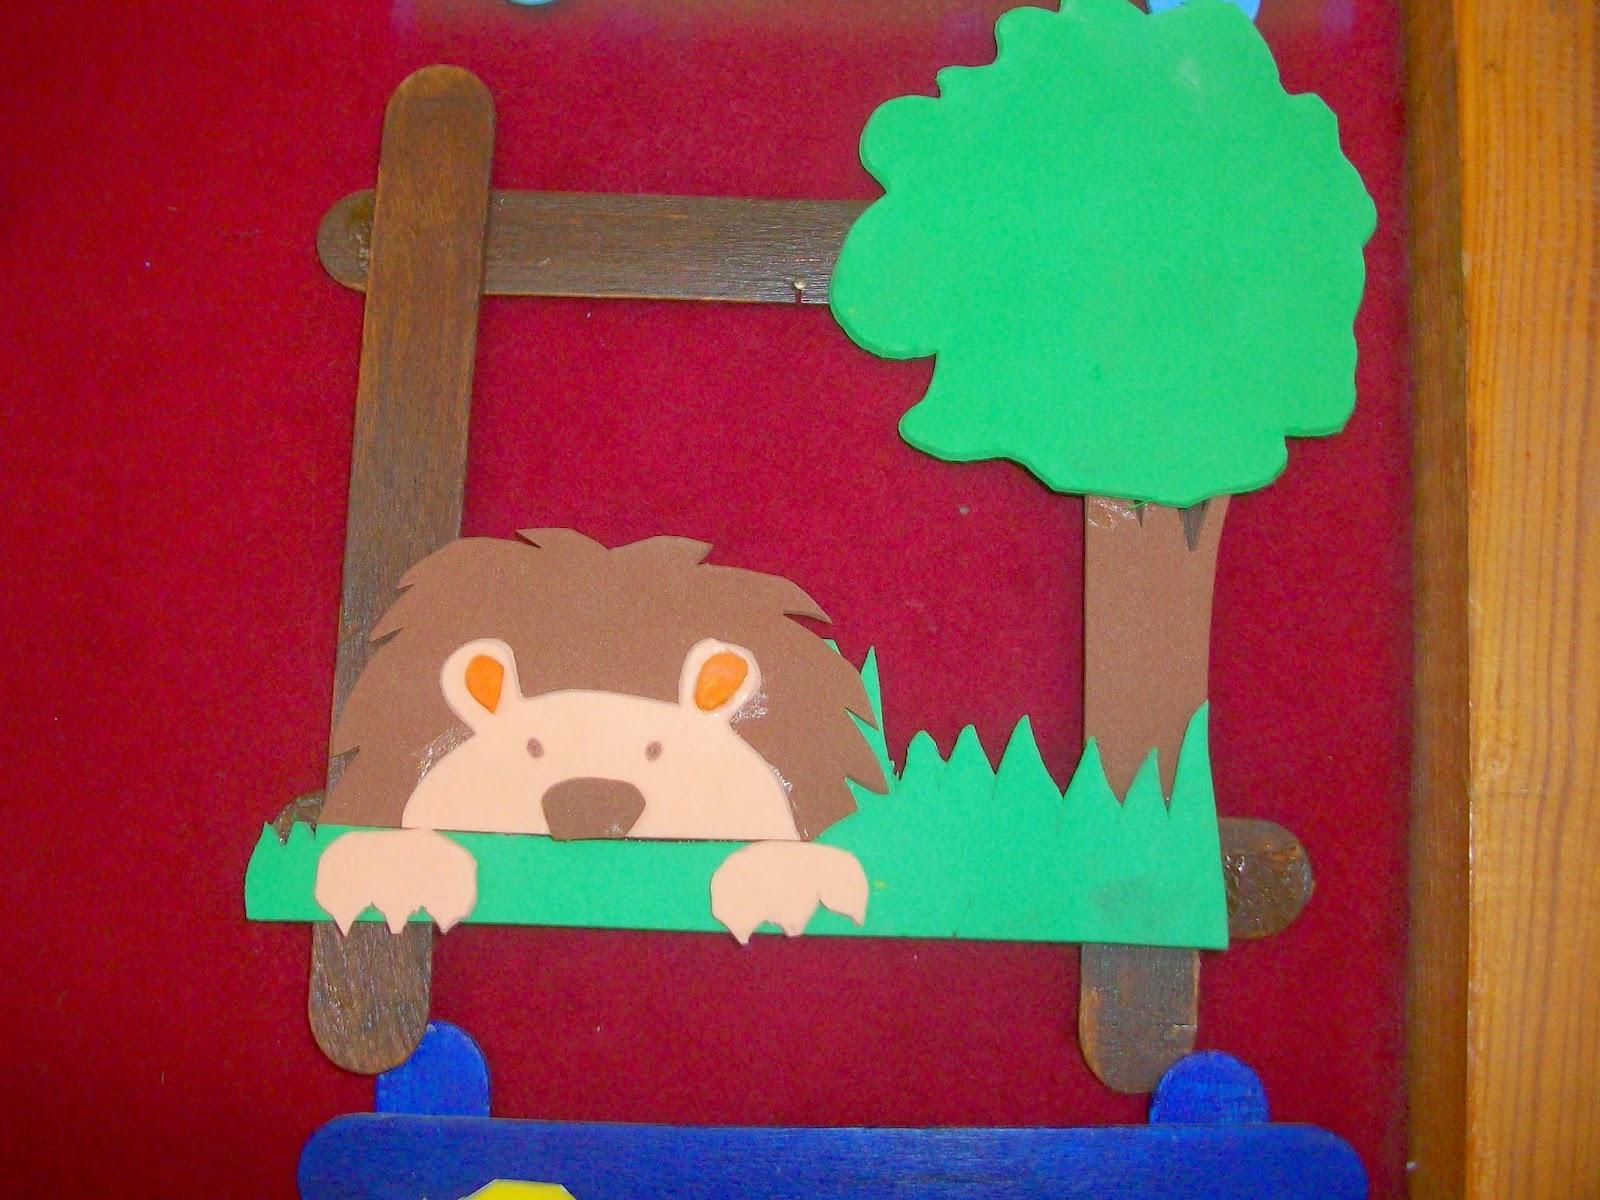 Frame Craft Idea For Kids Crafts And Worksheets For